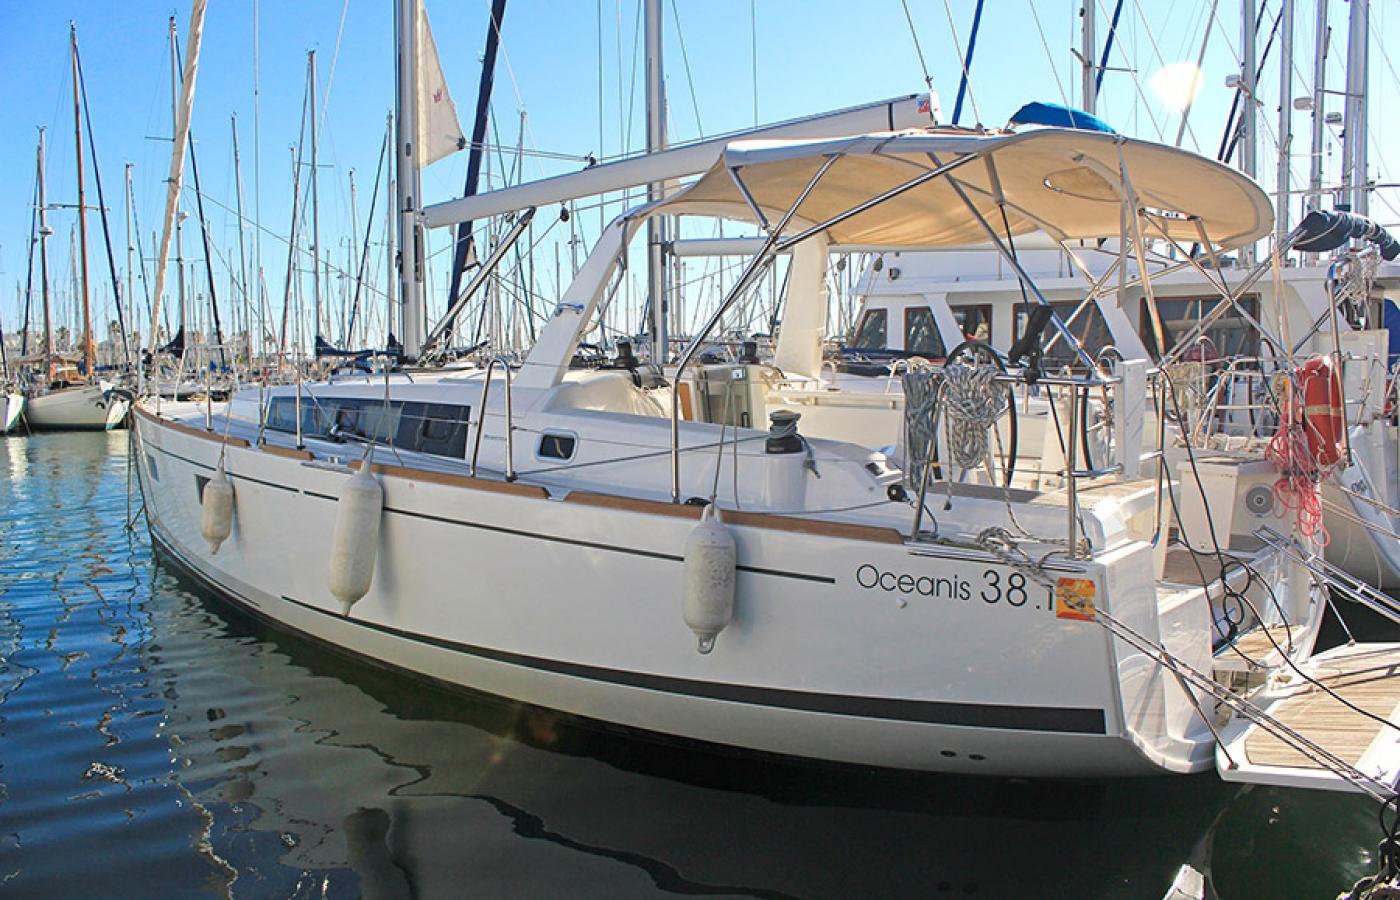 Beneteau Oceanis 38.1. - Tifon